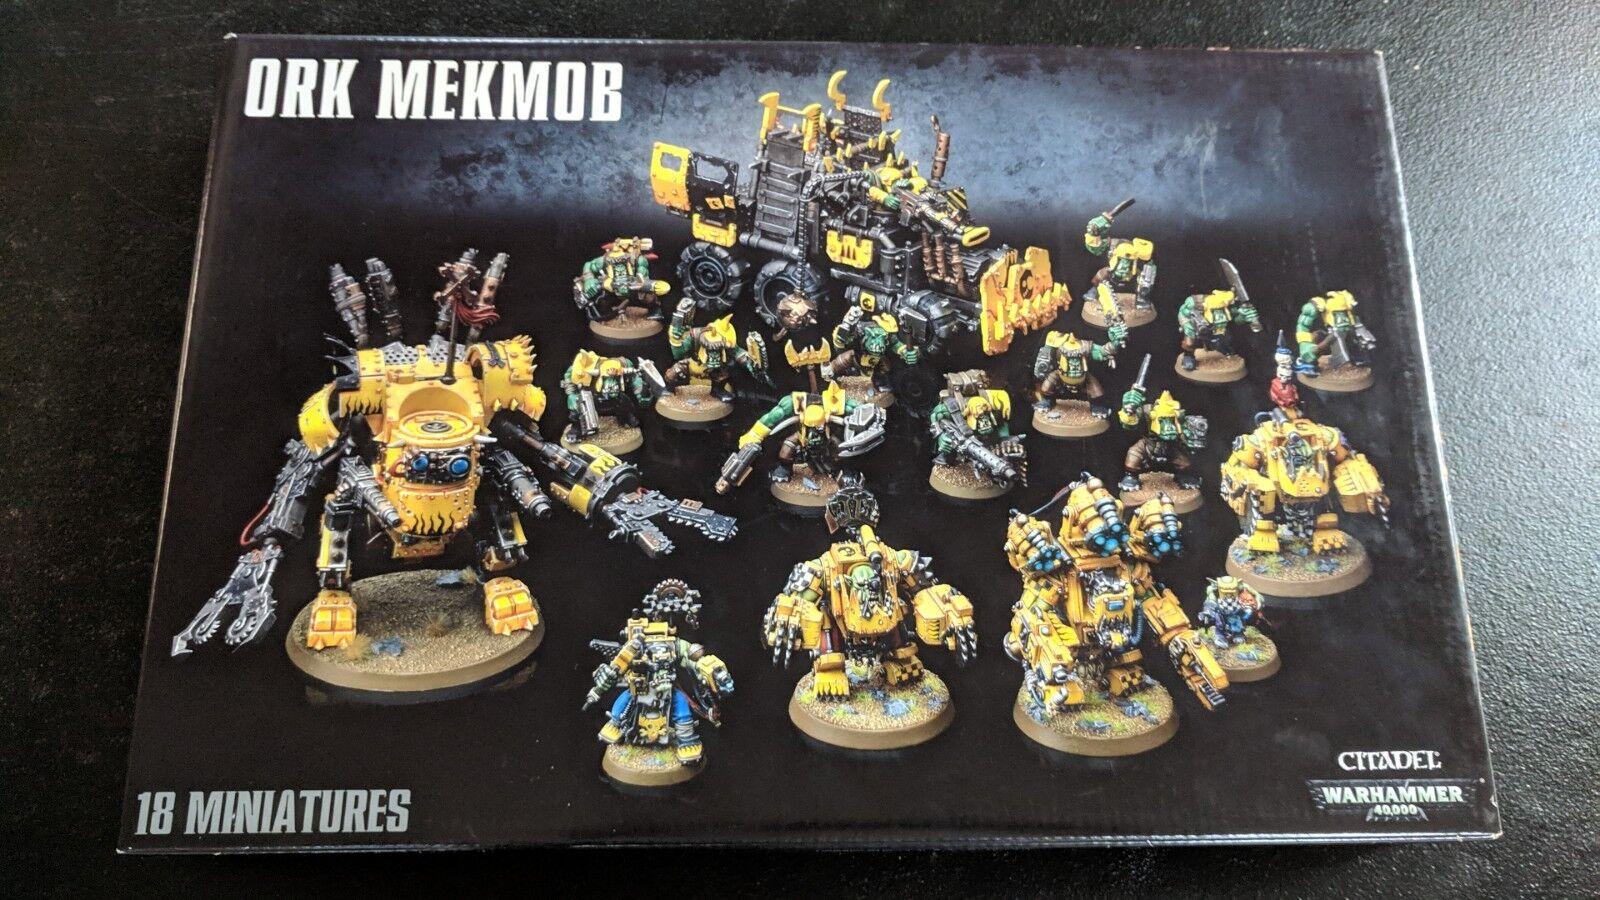 Ork Mekmob  Warhammer 40K Near Mint SEALED  all'ingrosso economico e di alta qualità